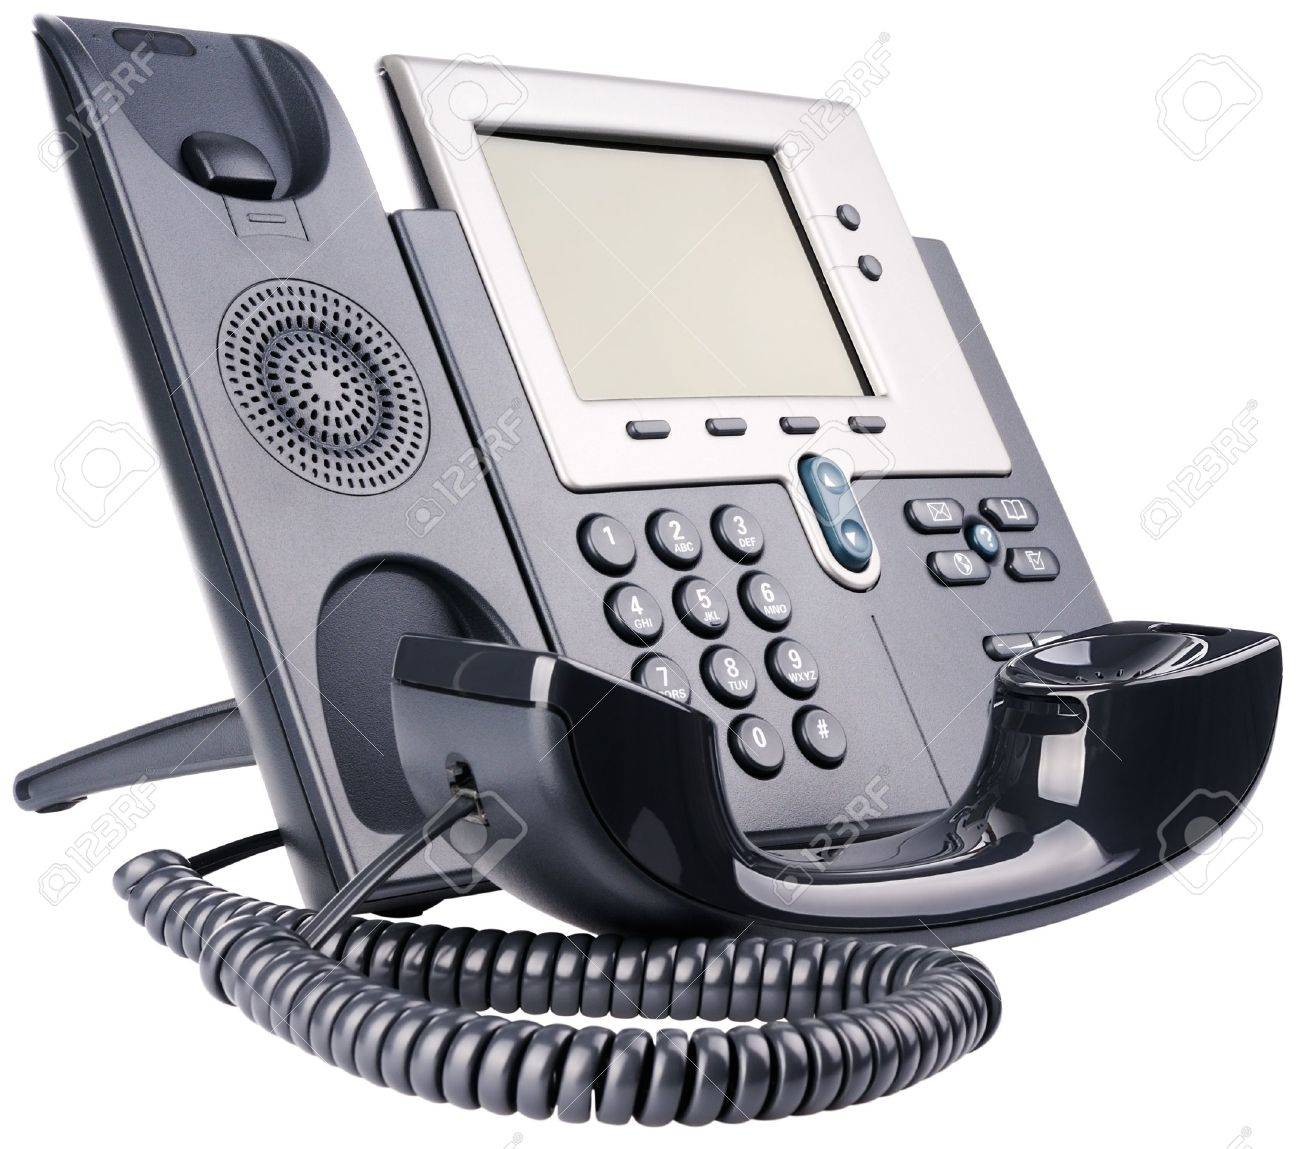 IP telephone set, off-hook, isolated on the white Stock Photo - 9404921